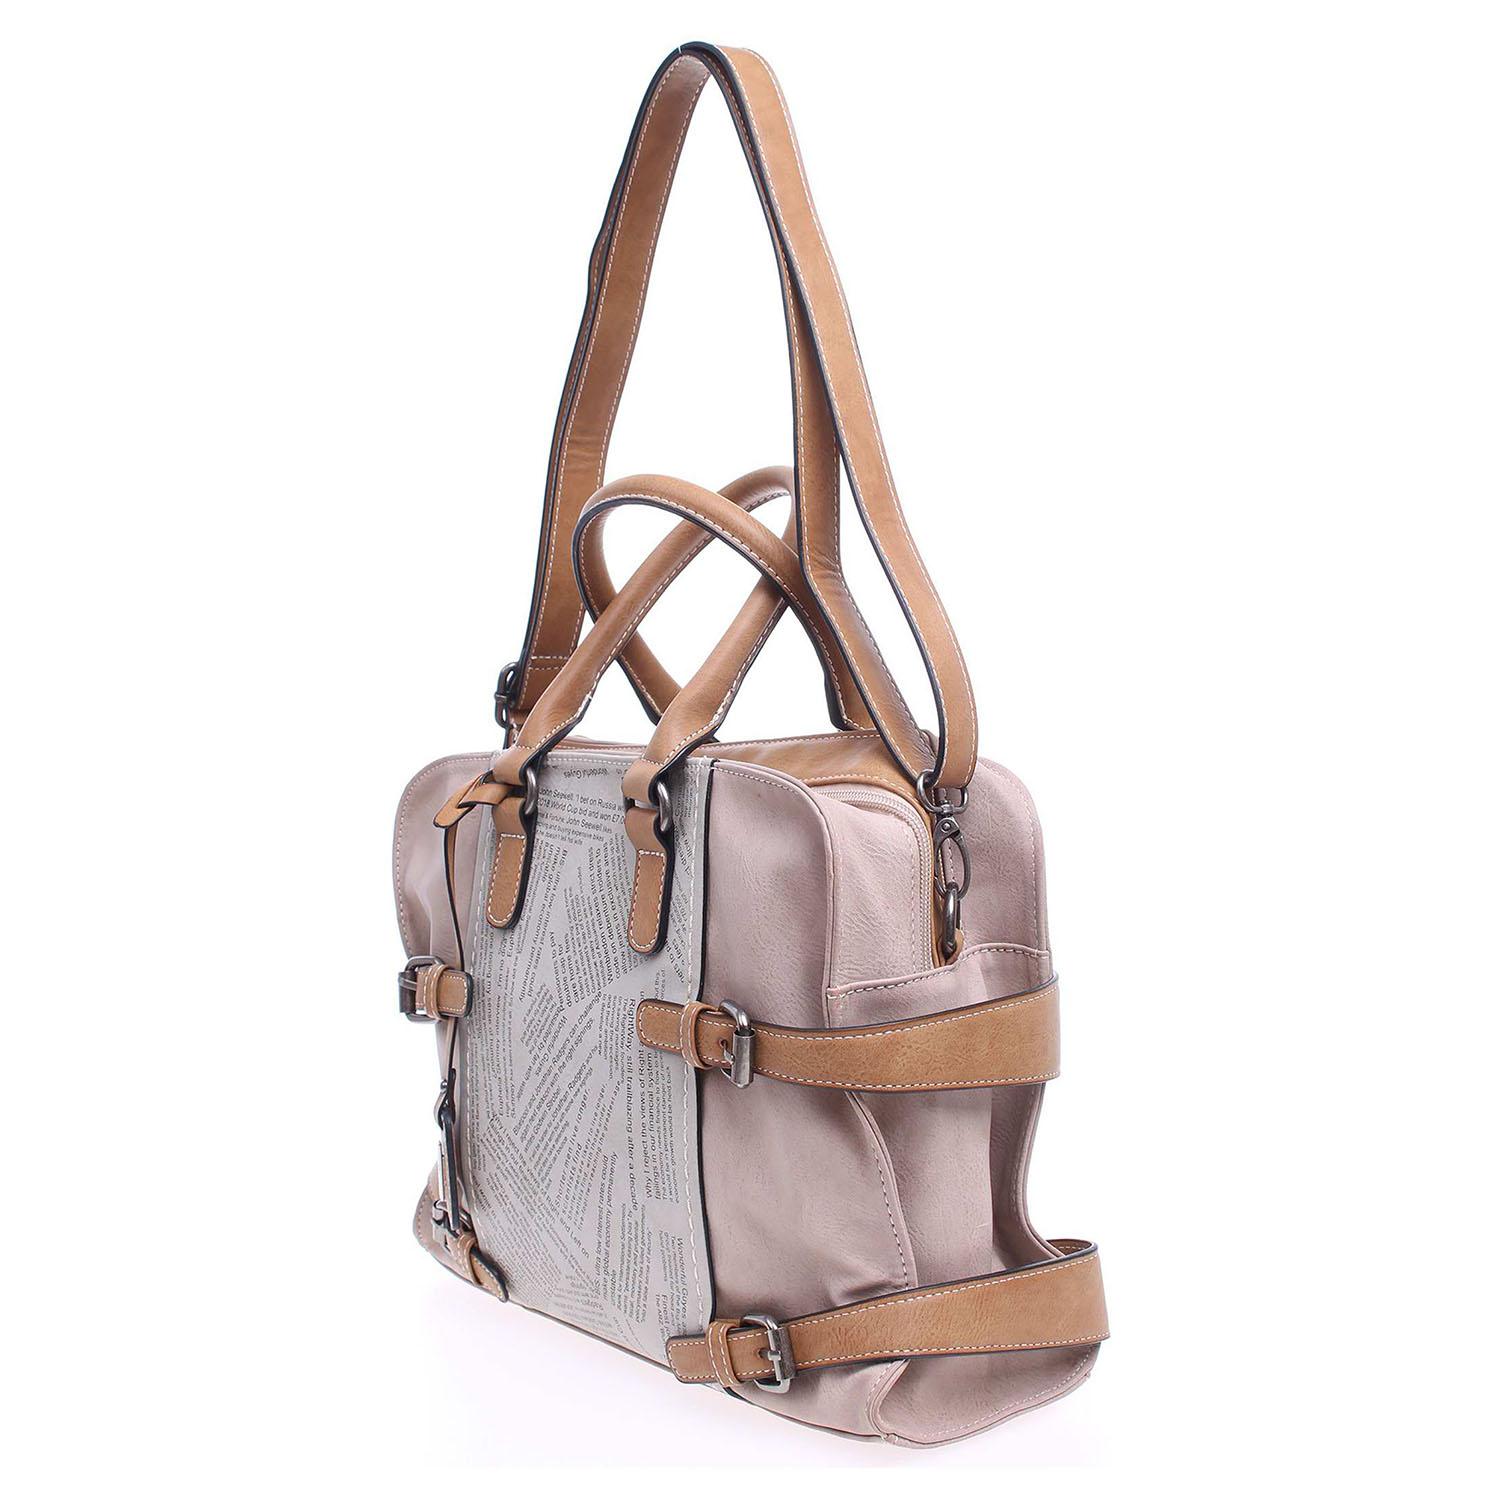 Rieker kabelka H1026-40 béžová-šedá  e704bbe4b27